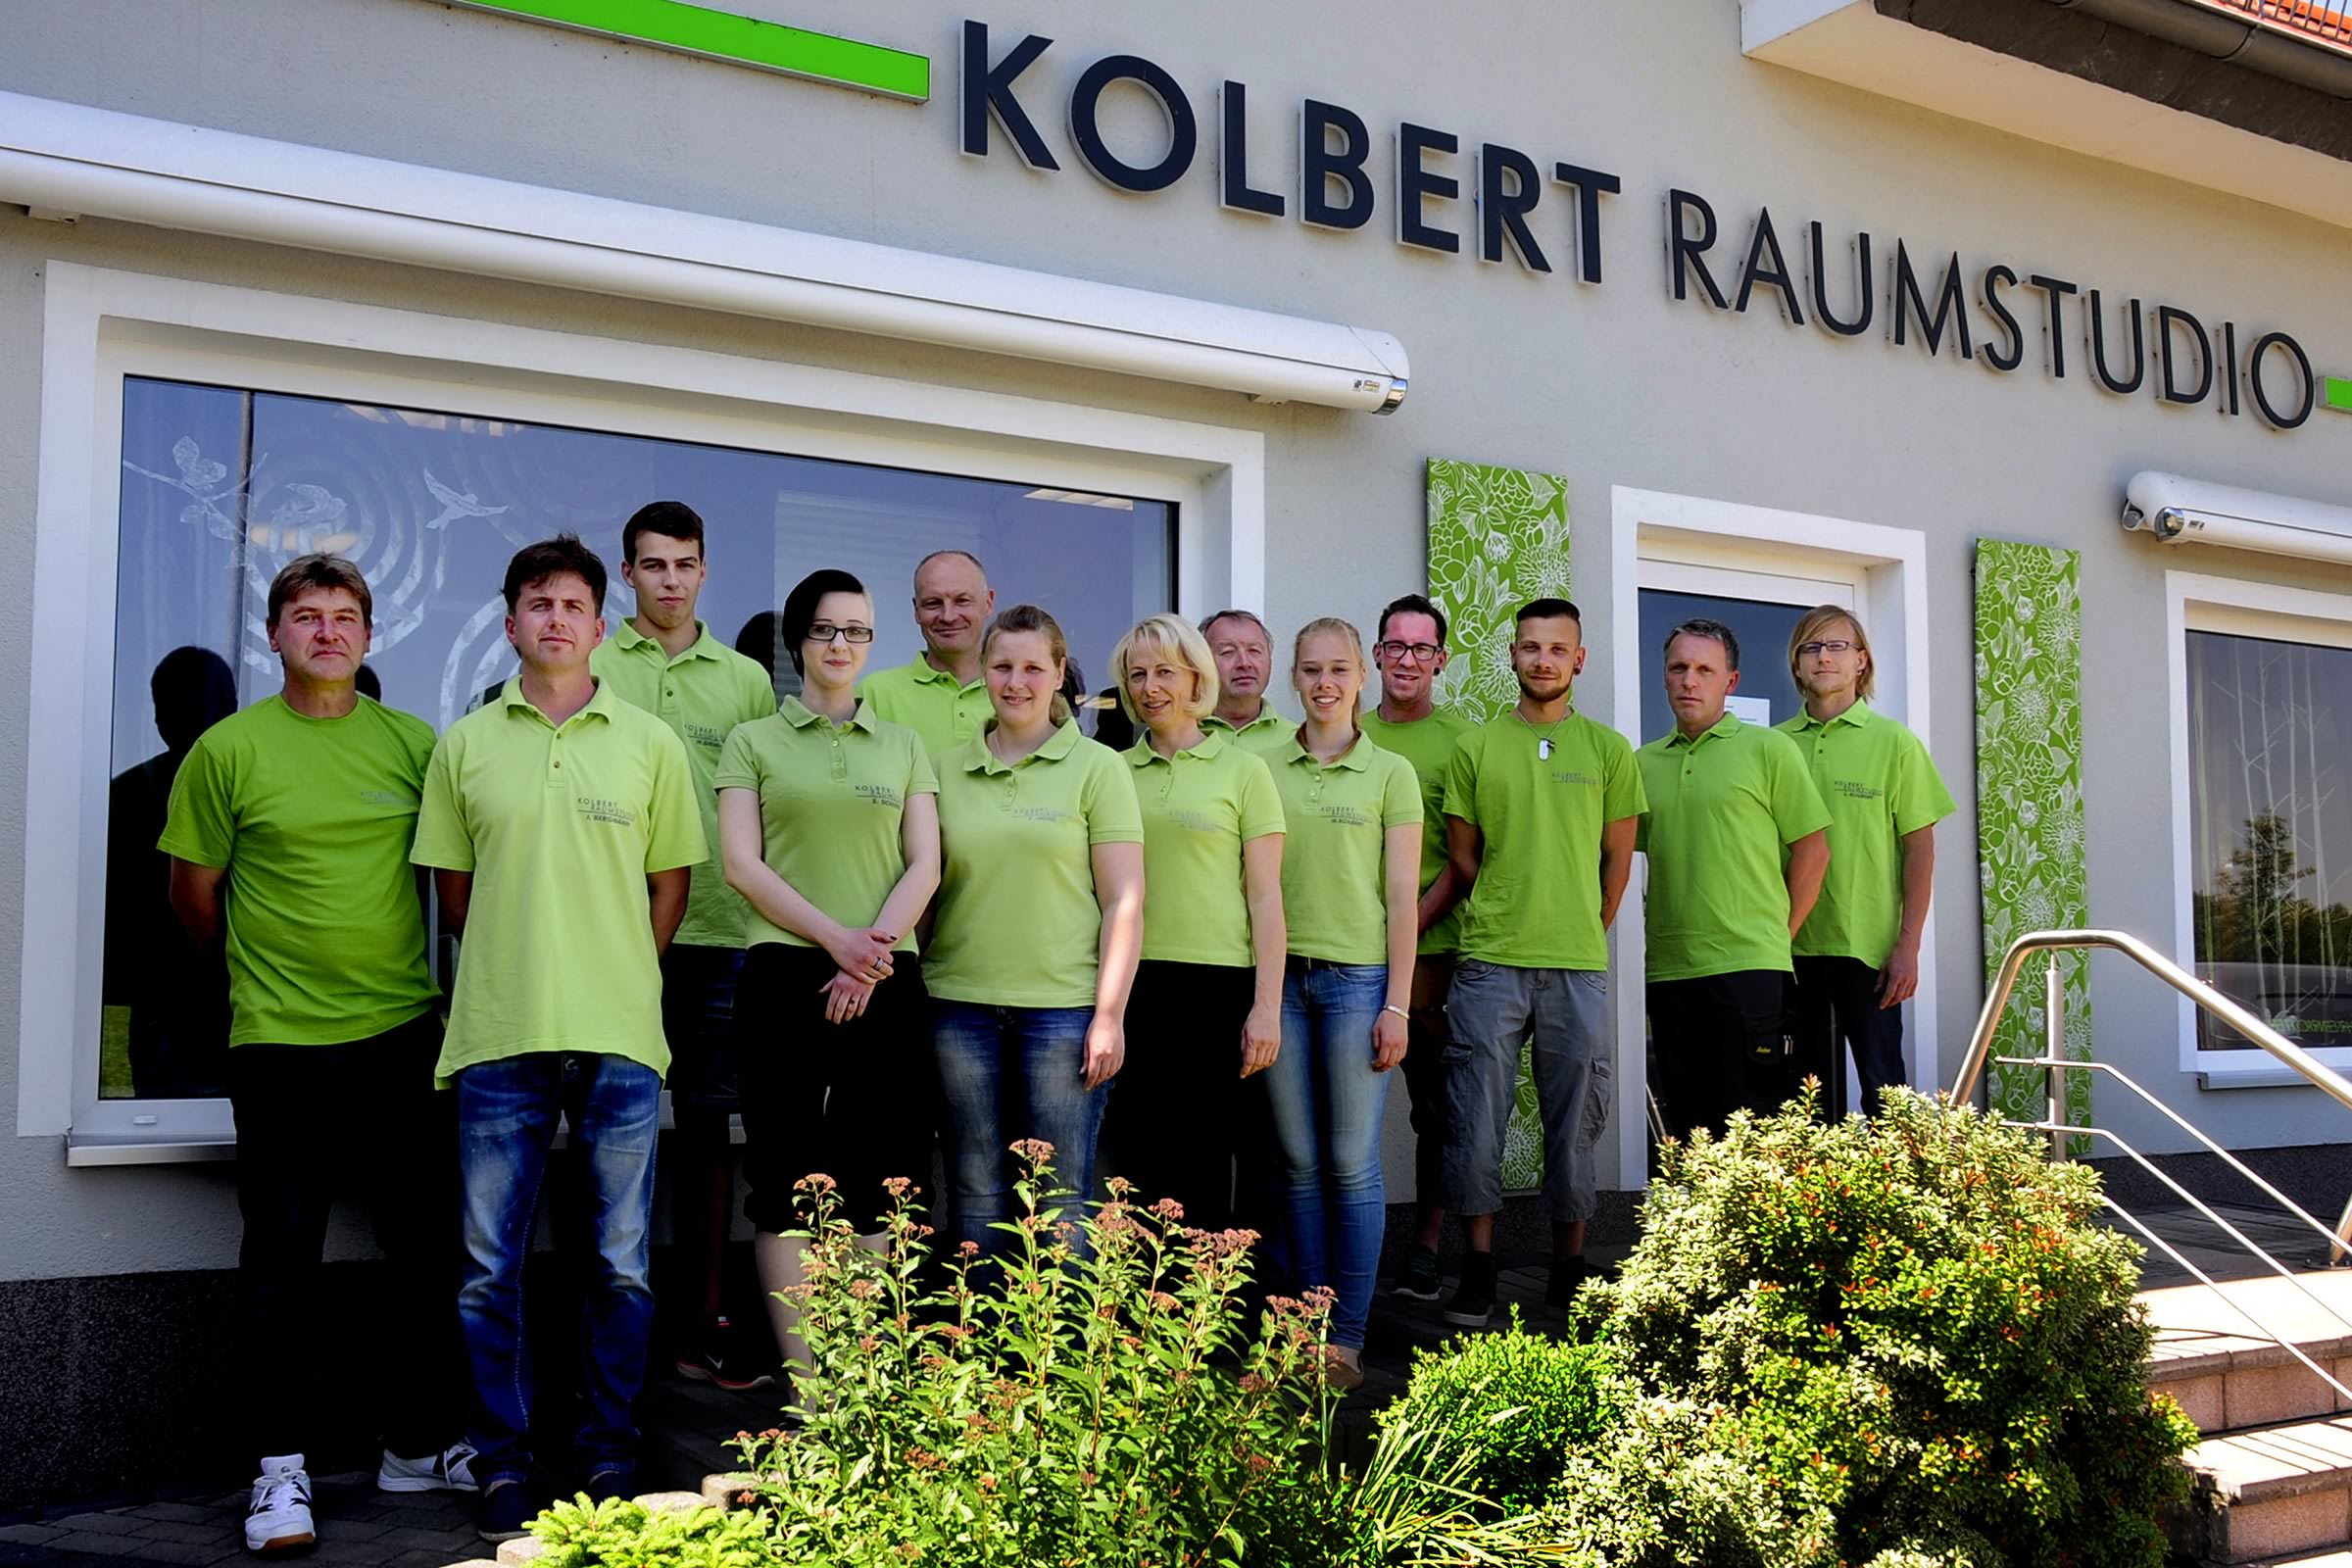 Kolbert_Raumstudio Team